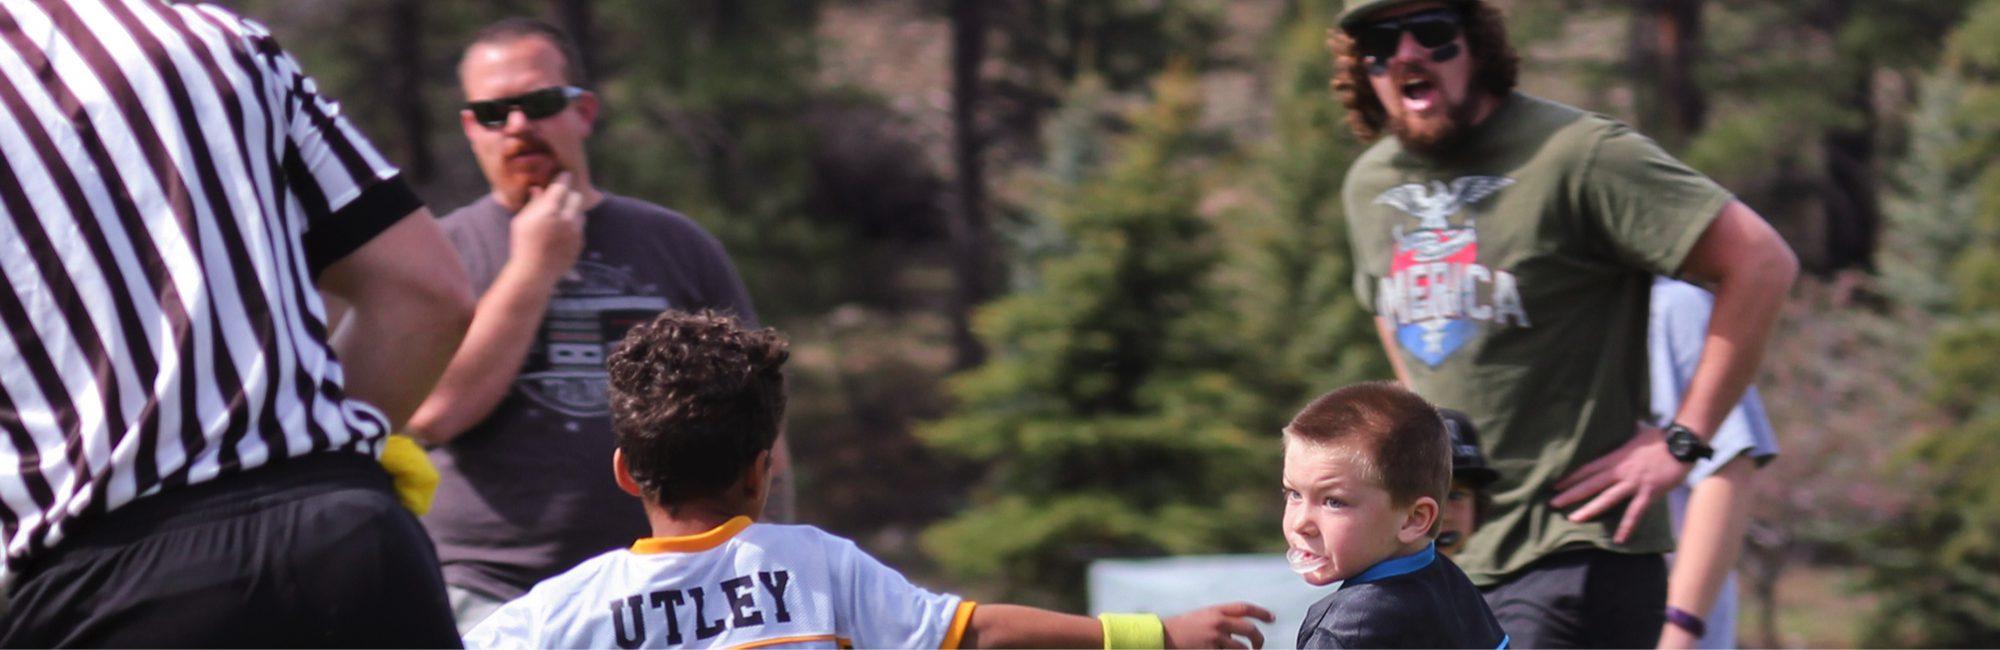 Sports & Parenting